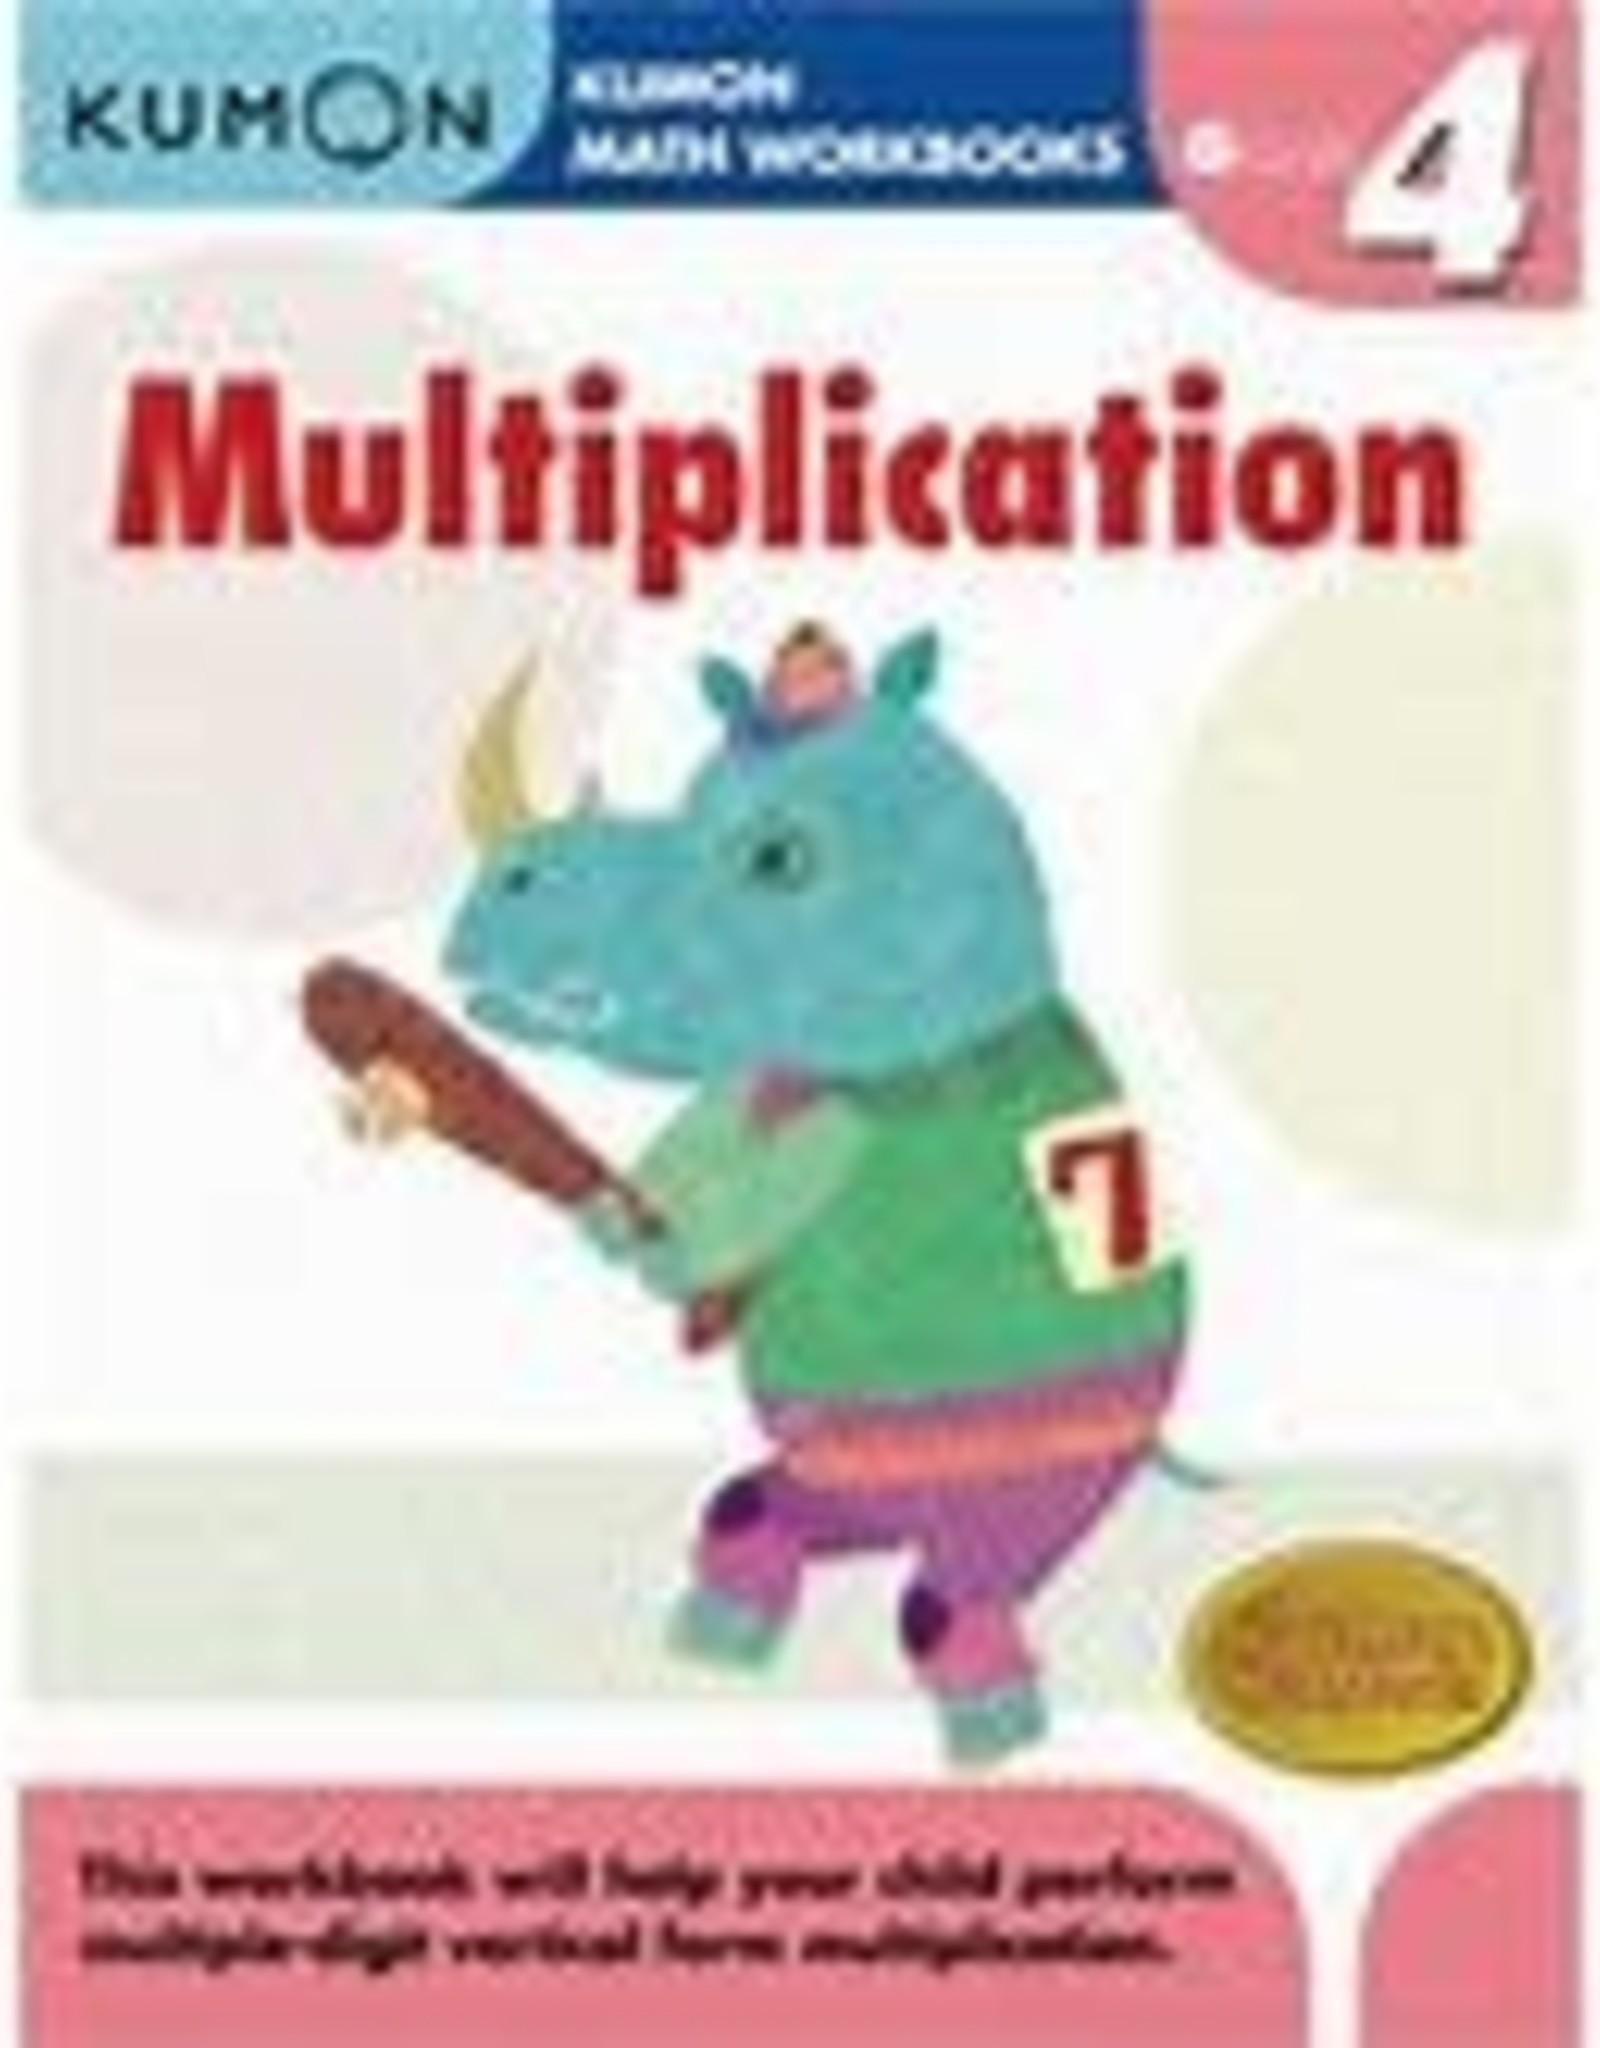 Kumon GRADE 4 MULTIPLICATION